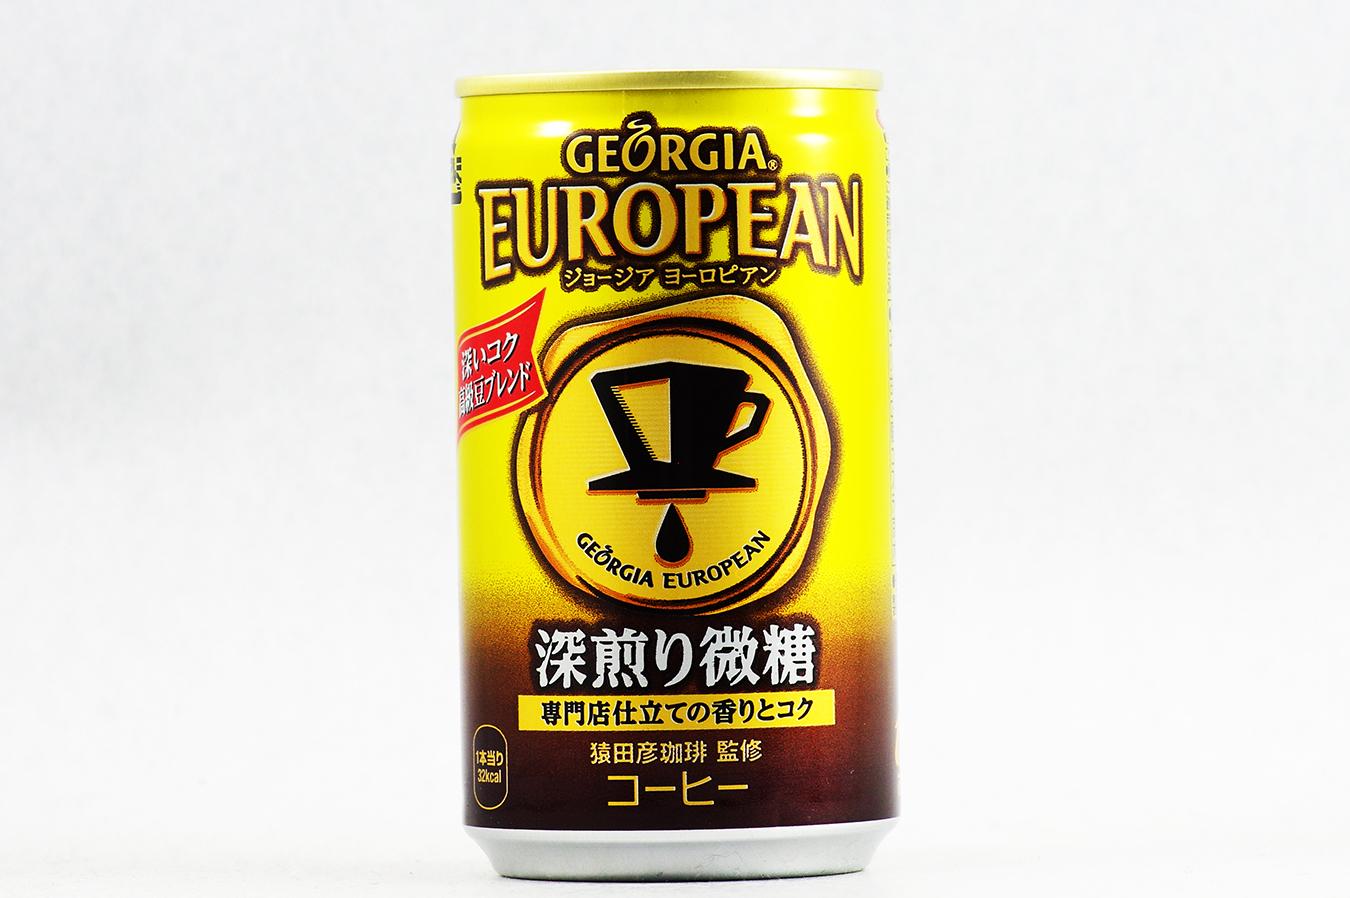 GEORGIA ヨーロピアン 深煎り微糖 170g缶 2018年6月